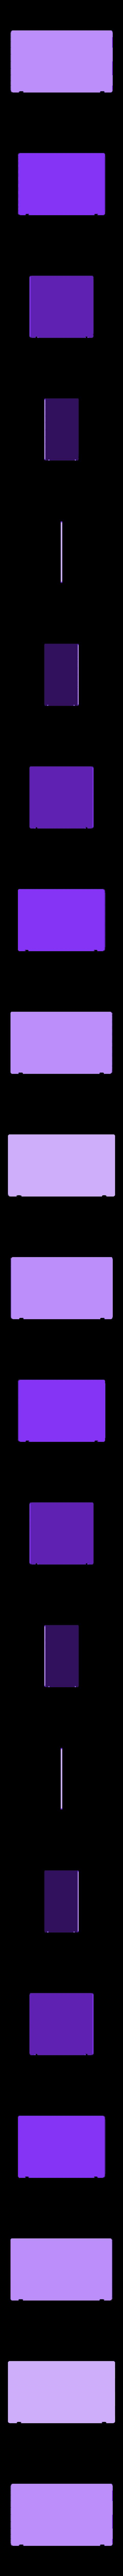 GlassScreen (repaired).stl Download STL file Nintendo switch modèle • 3D print design, Shigeryu